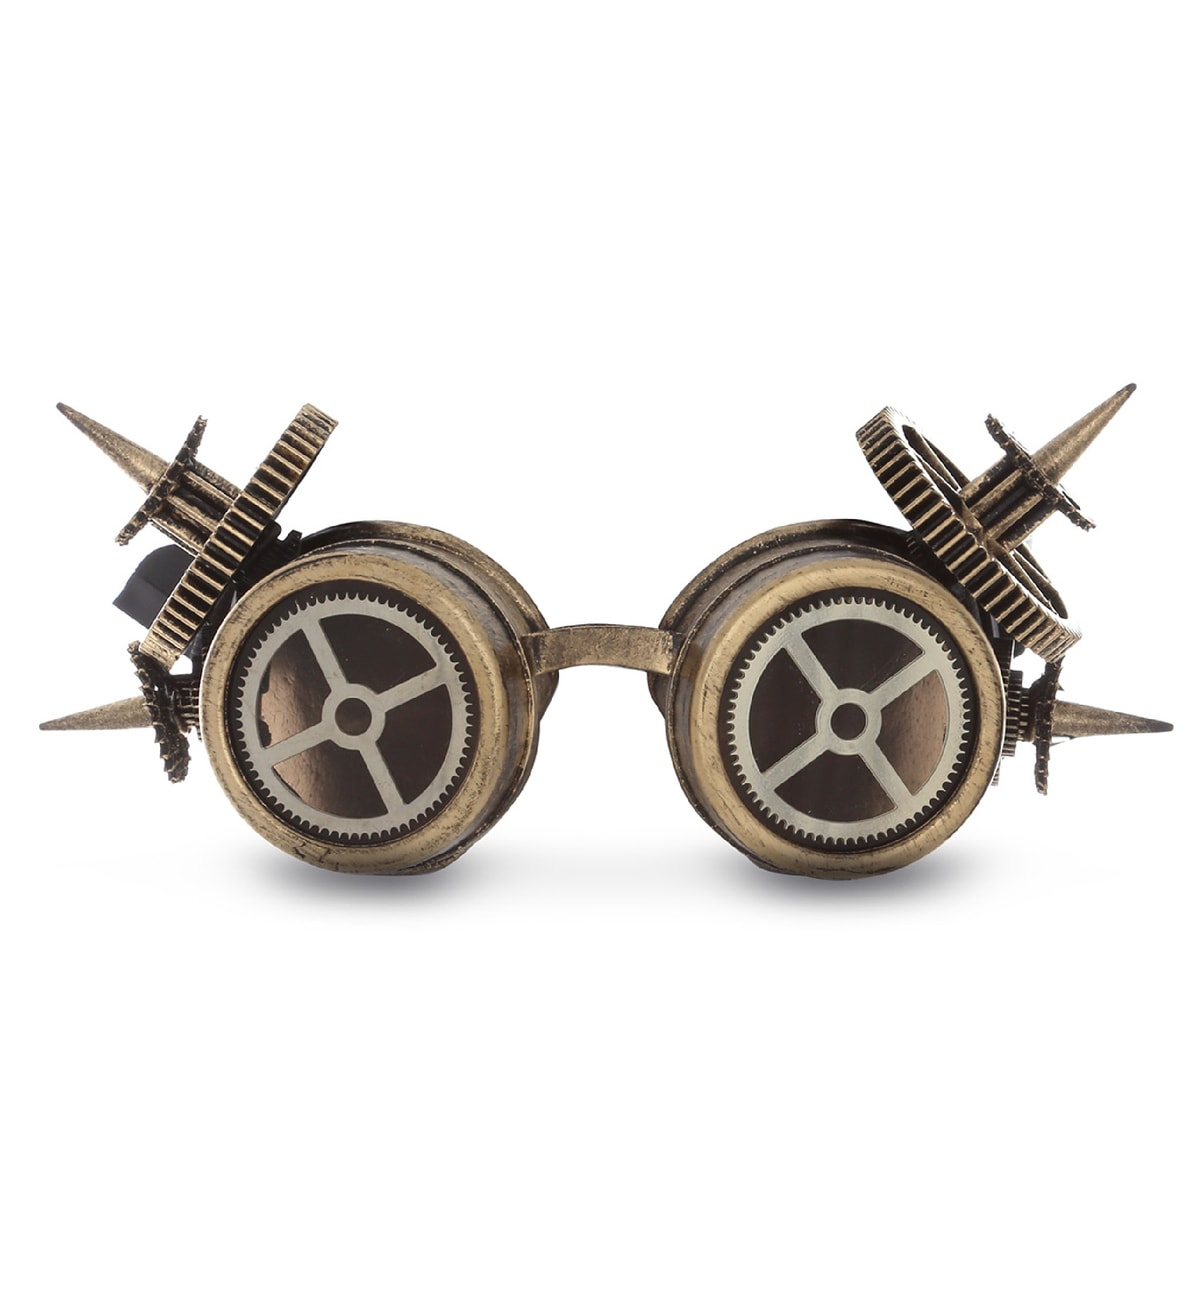 Bronze Spike Steam Punk Rocker Biker Vintage Aviator Goggles Costume Accessory